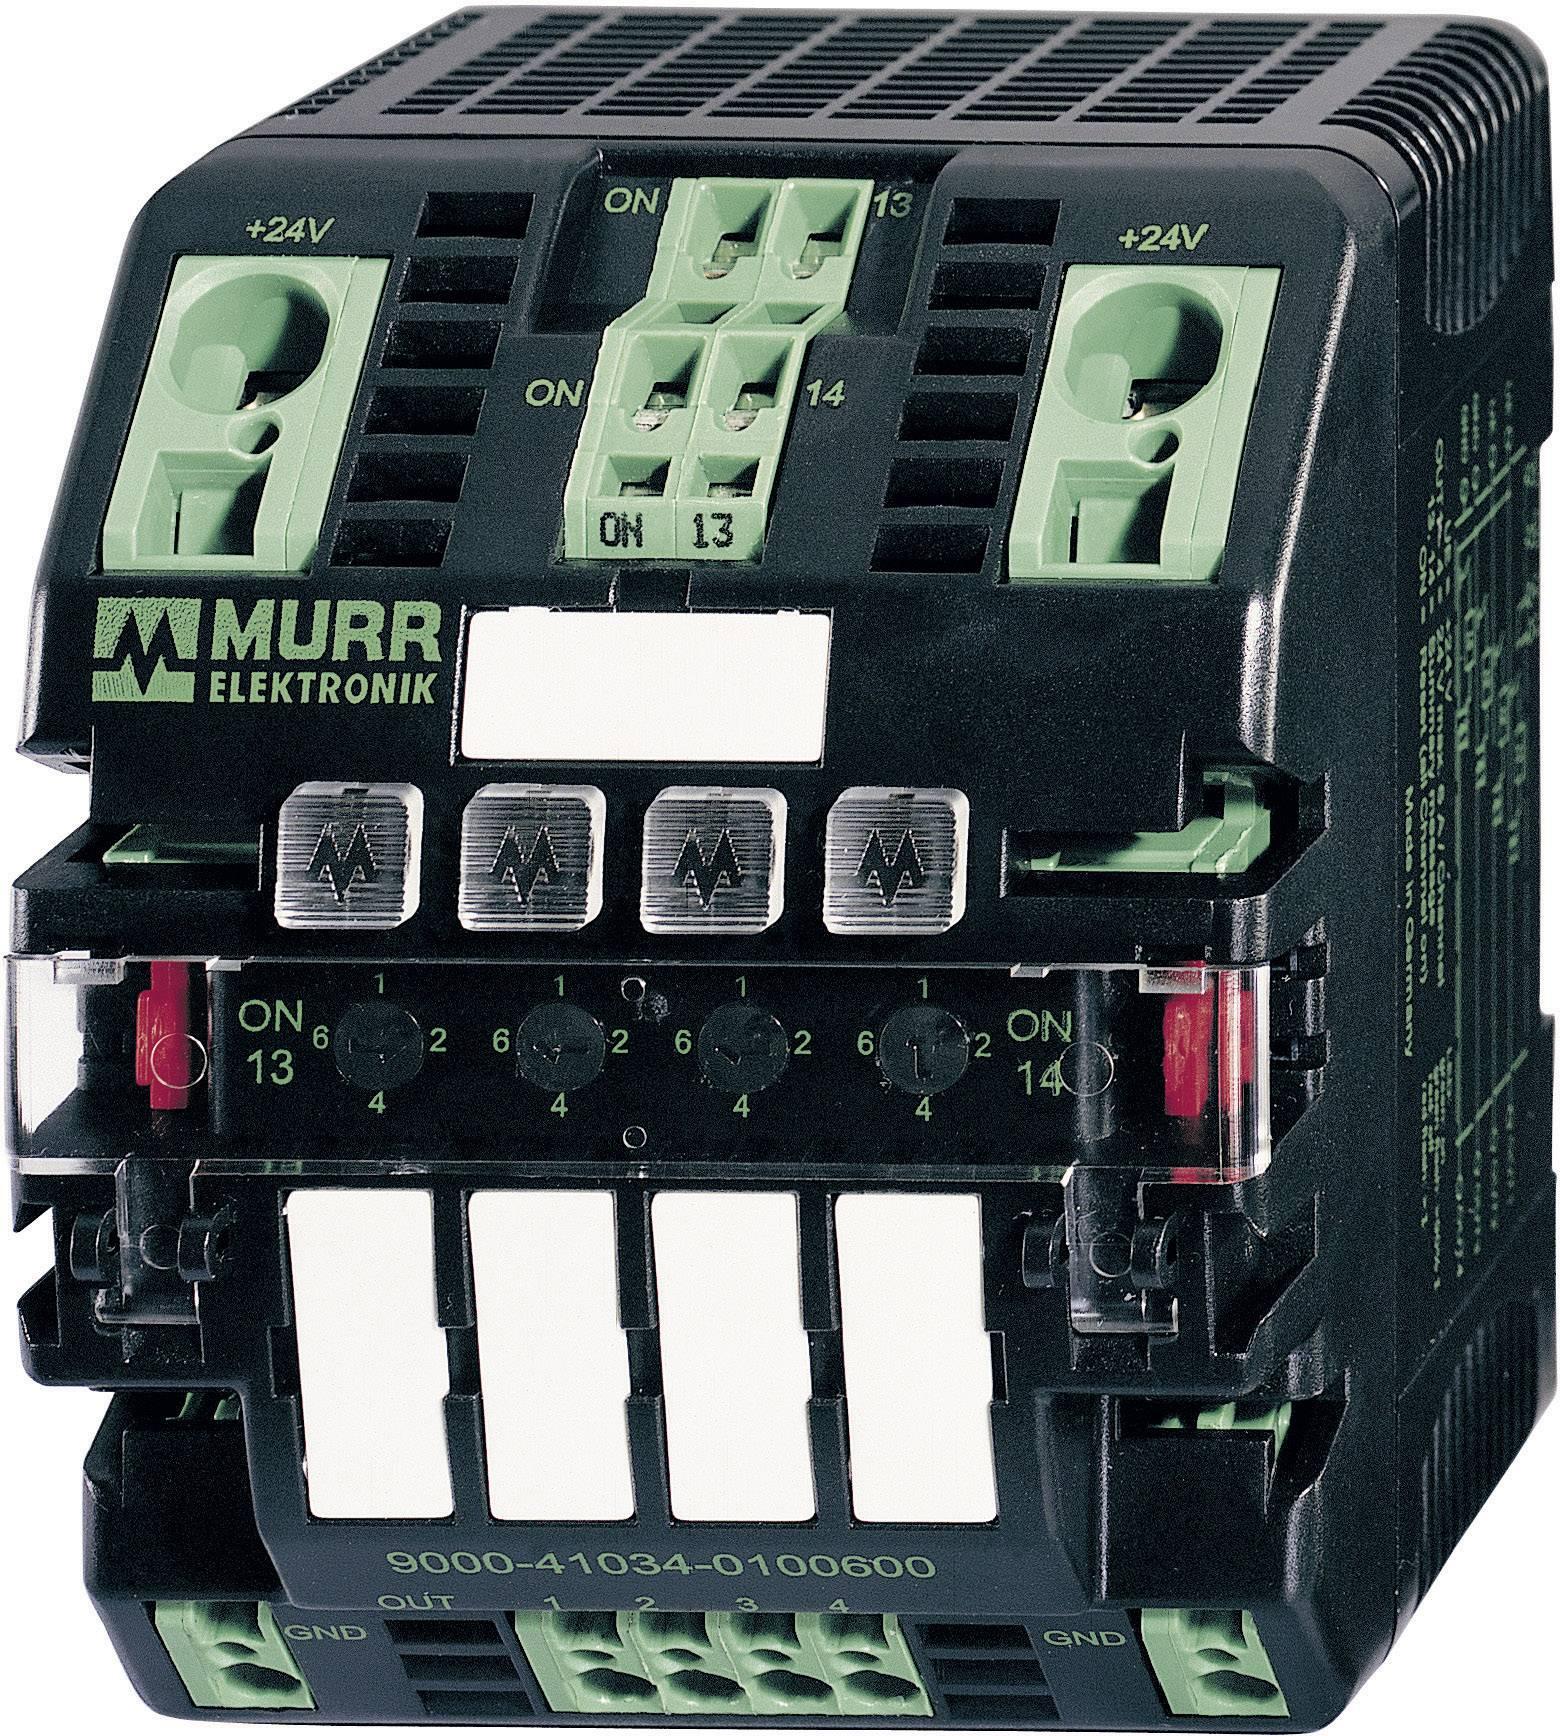 Modul pro kontrolu proudu na DIN lištu Murr Elektronik Mico 4.10, 24 - 30 V/DC